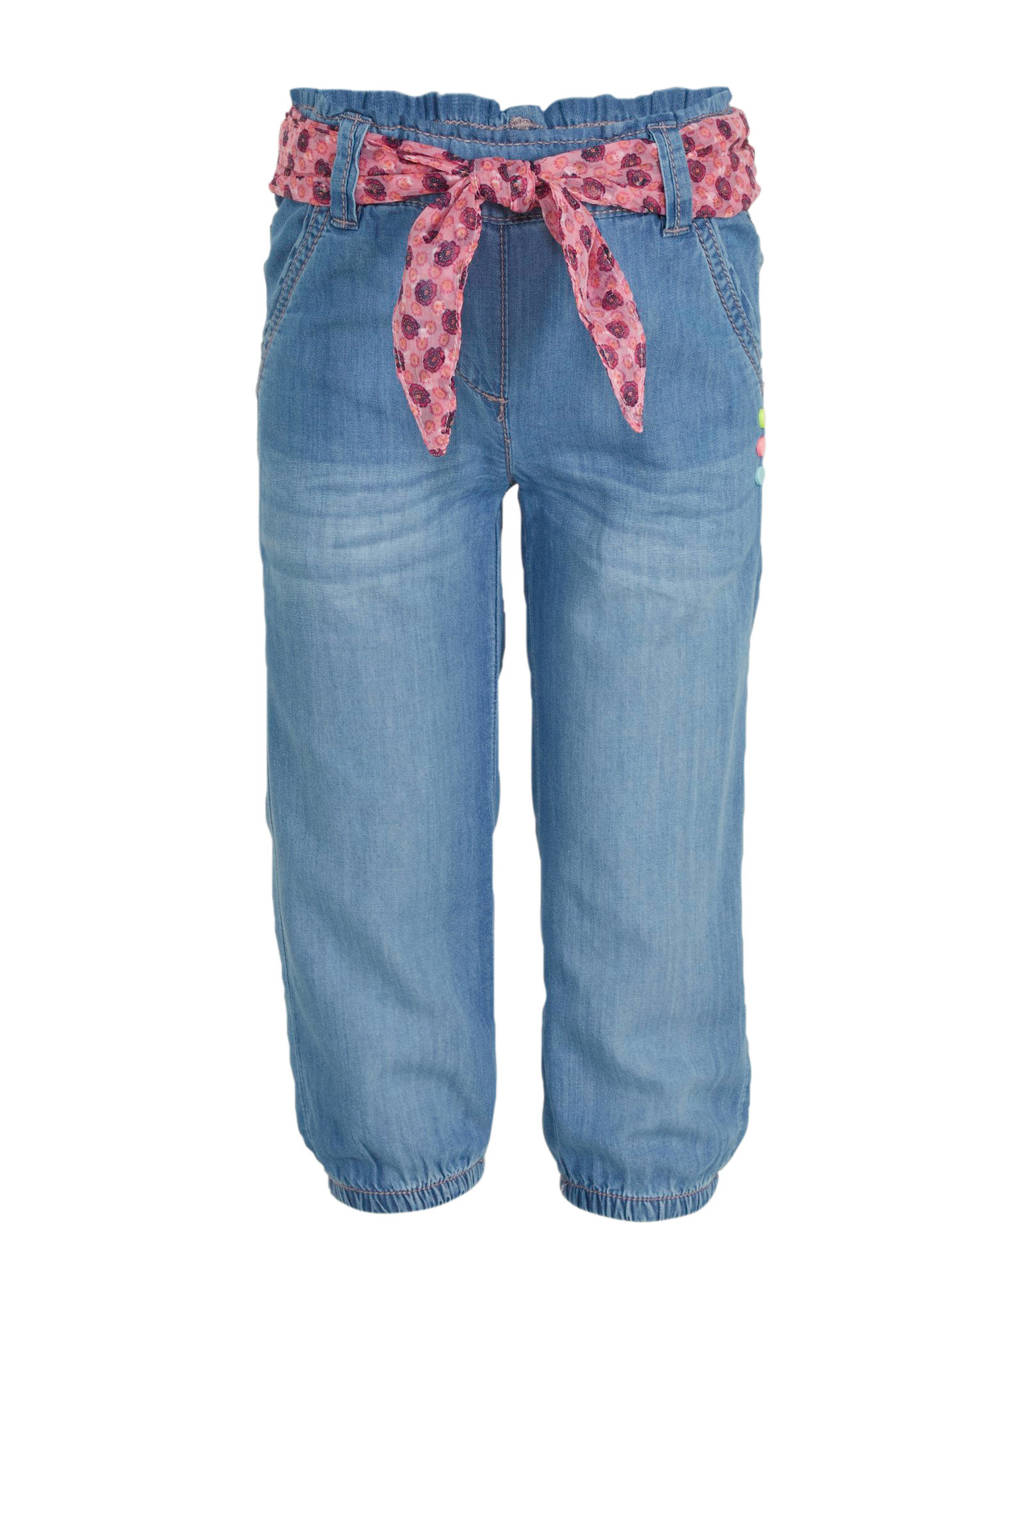 s.Oliver slim fit capri jeans met chiffon ceintuur stonewashed, Stonewashed